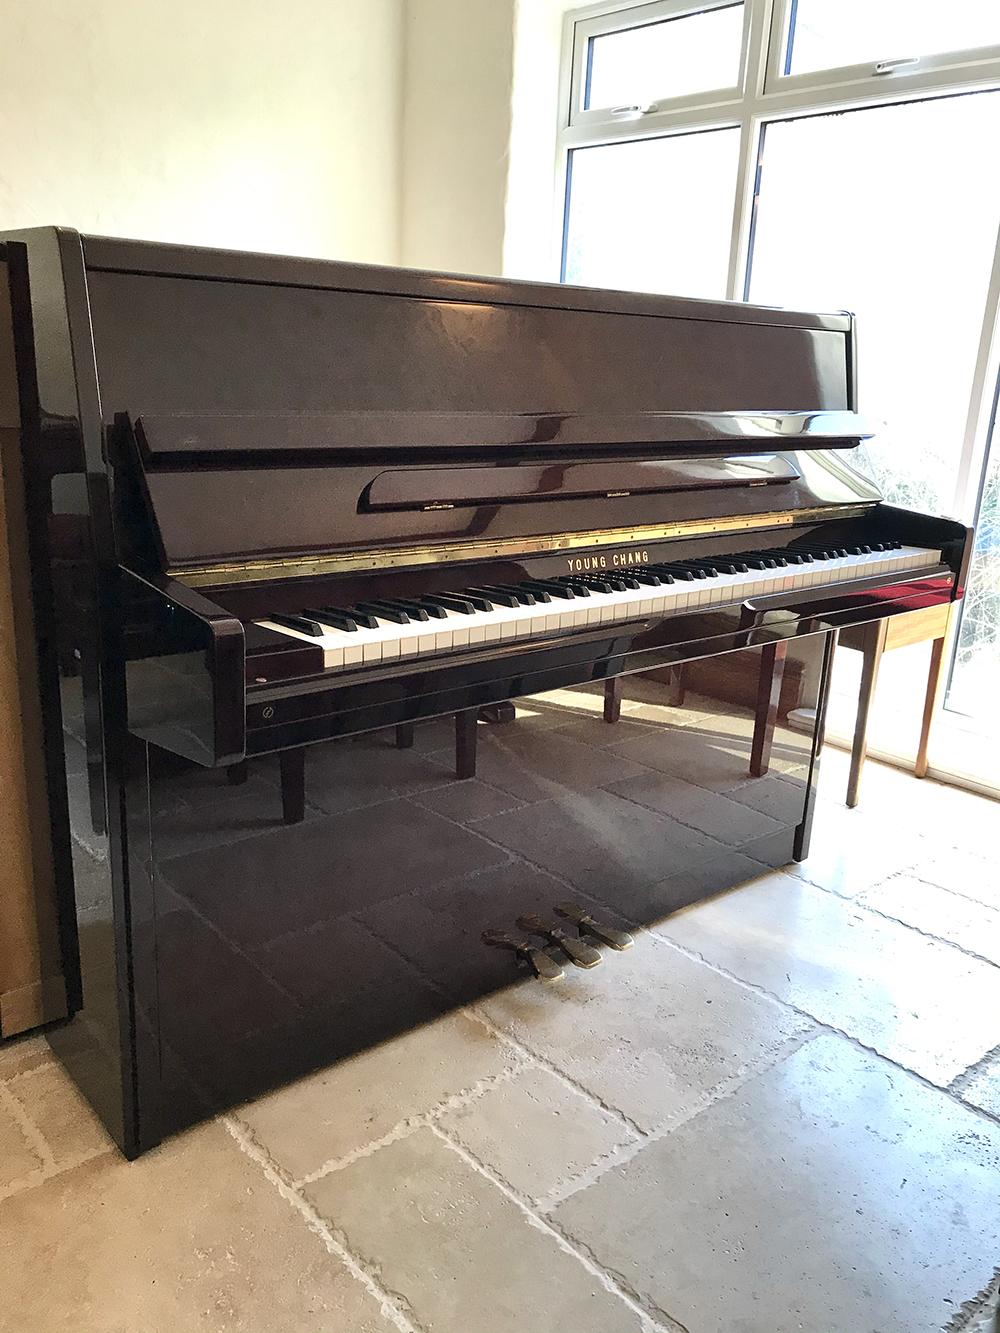 young,chang,piano,upright,used,quality,cheap,dorset,mahogany